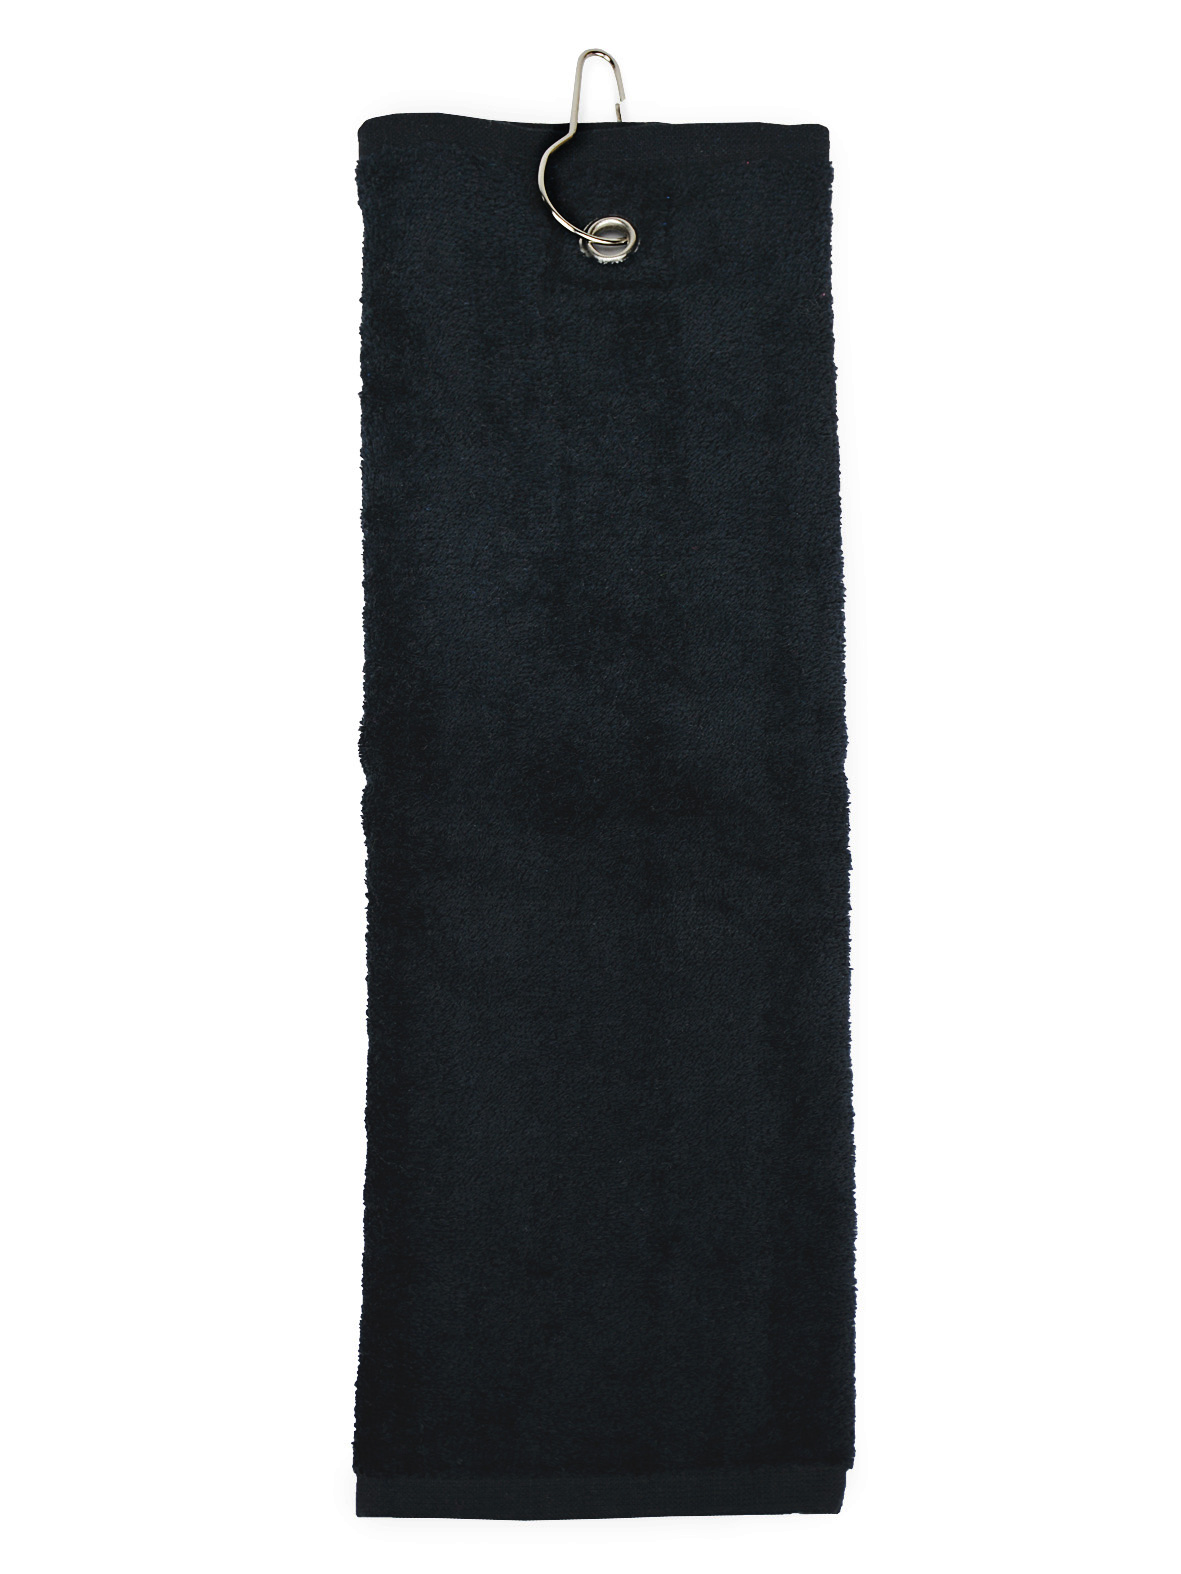 The One Golfhanddoek 30x50 cm 450 gram Zwart